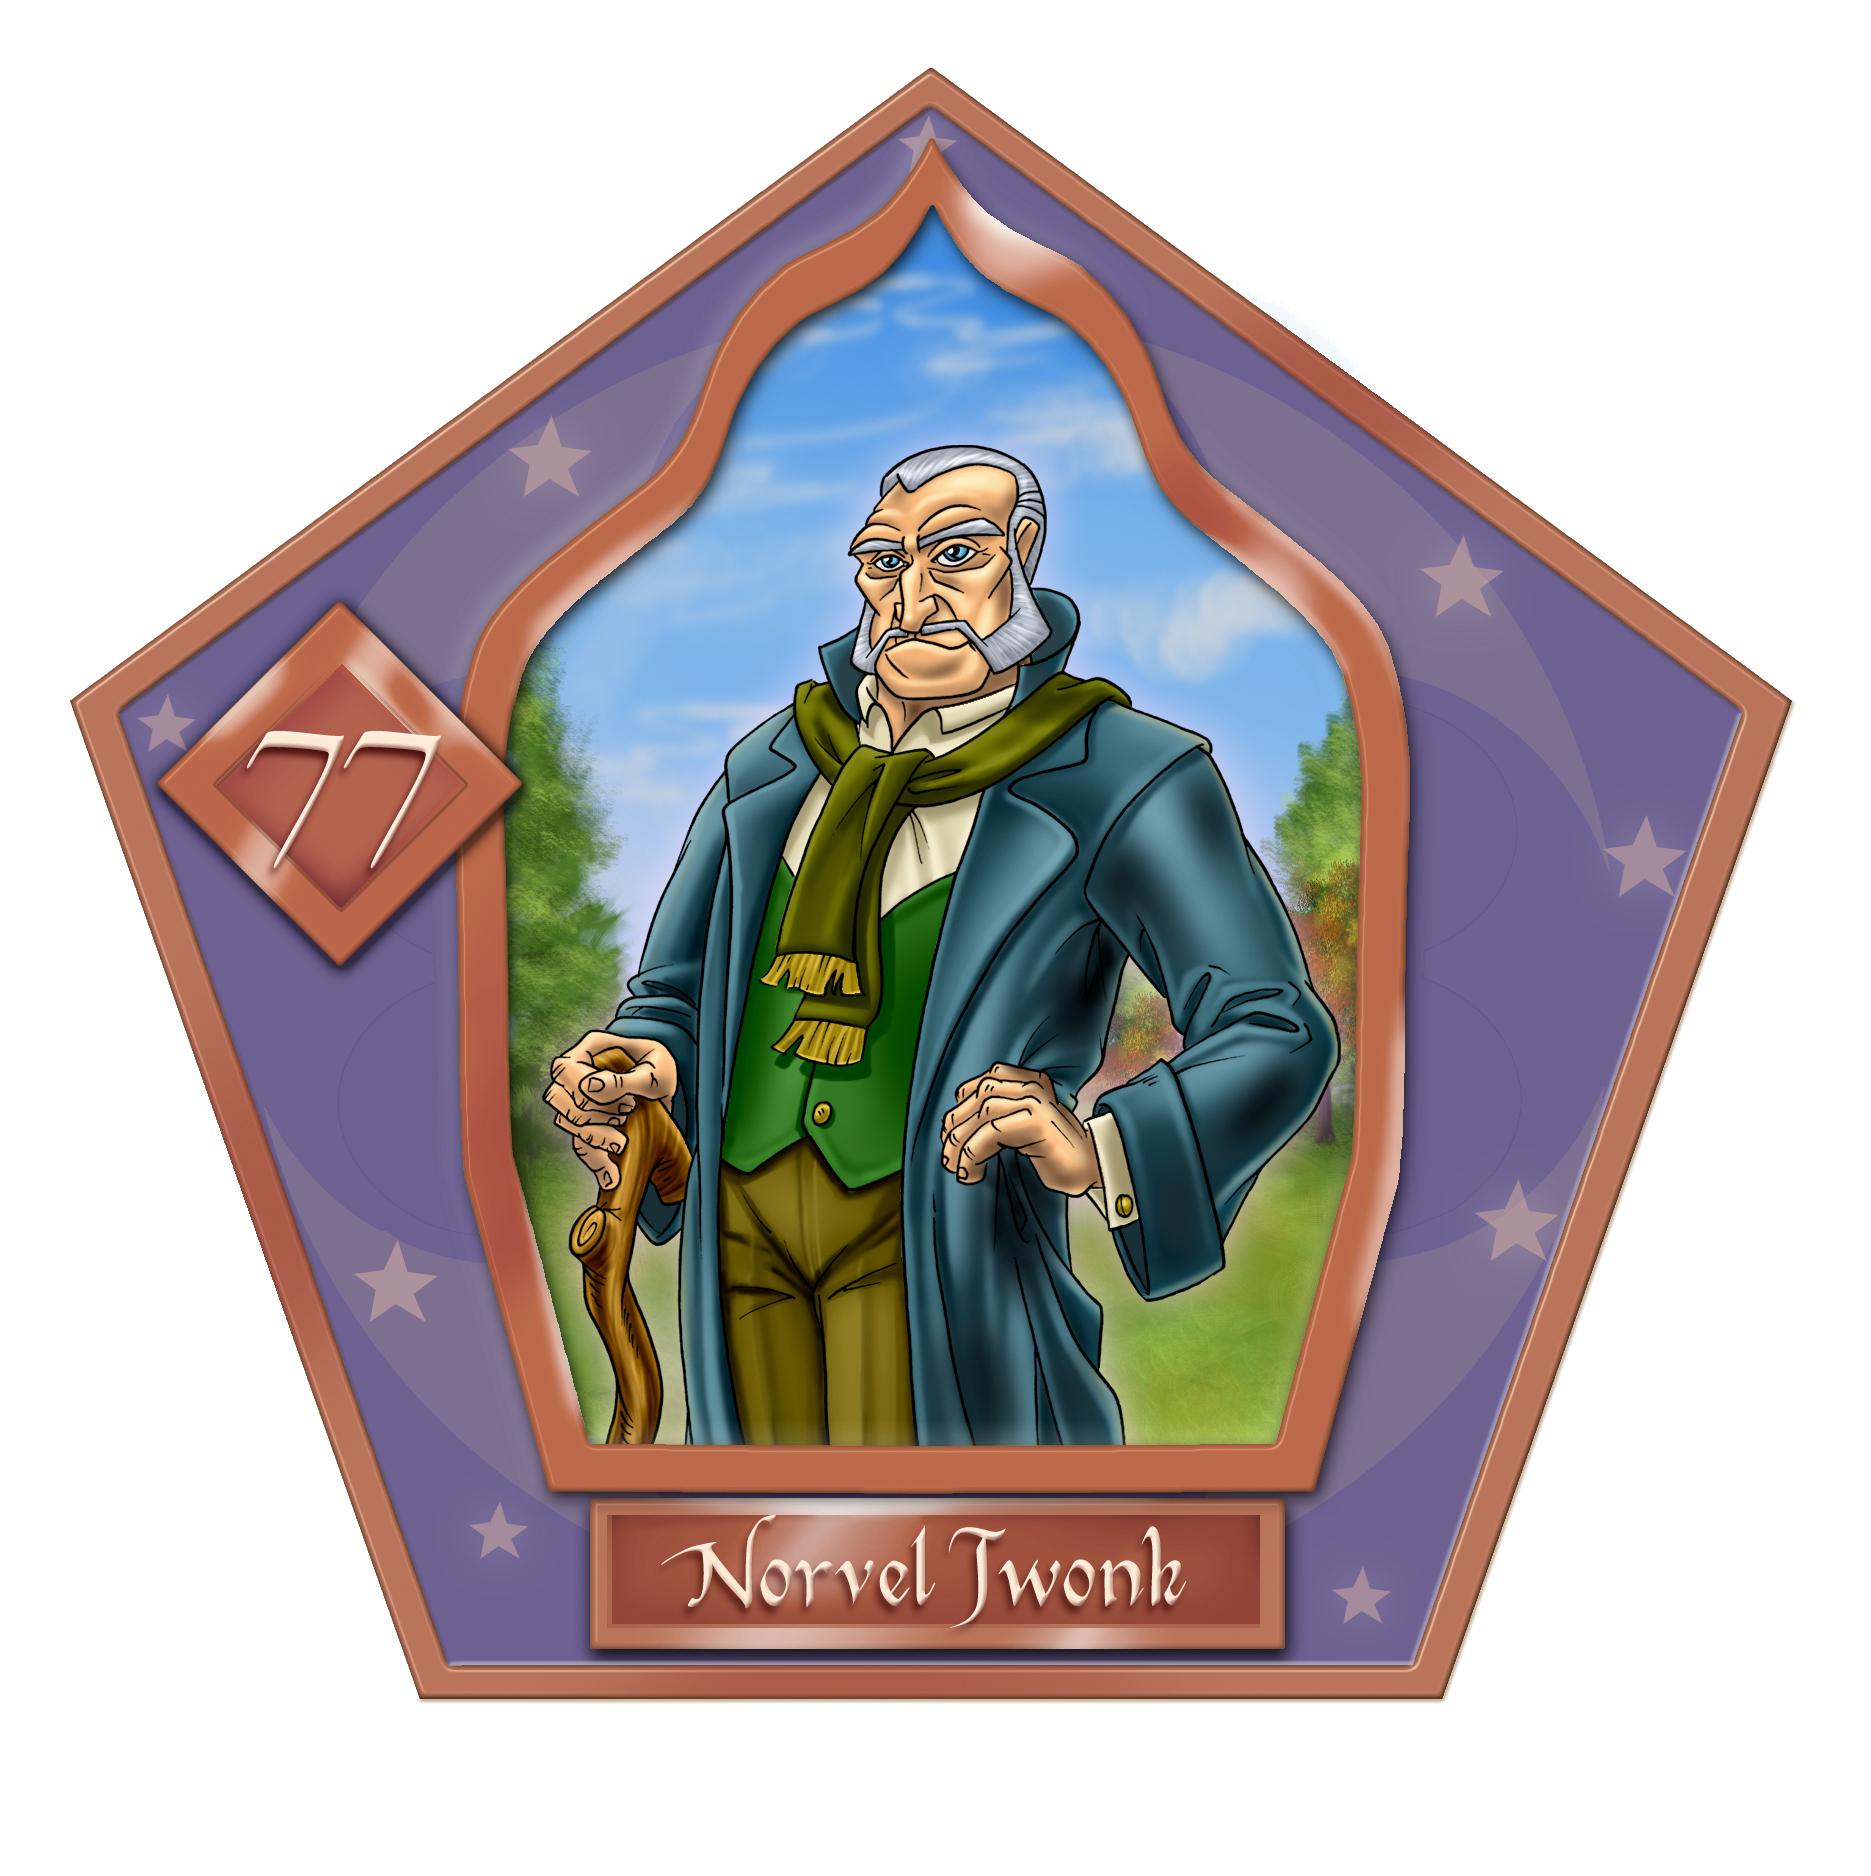 File:Norvel Twonk-77-chocFrogCard.png